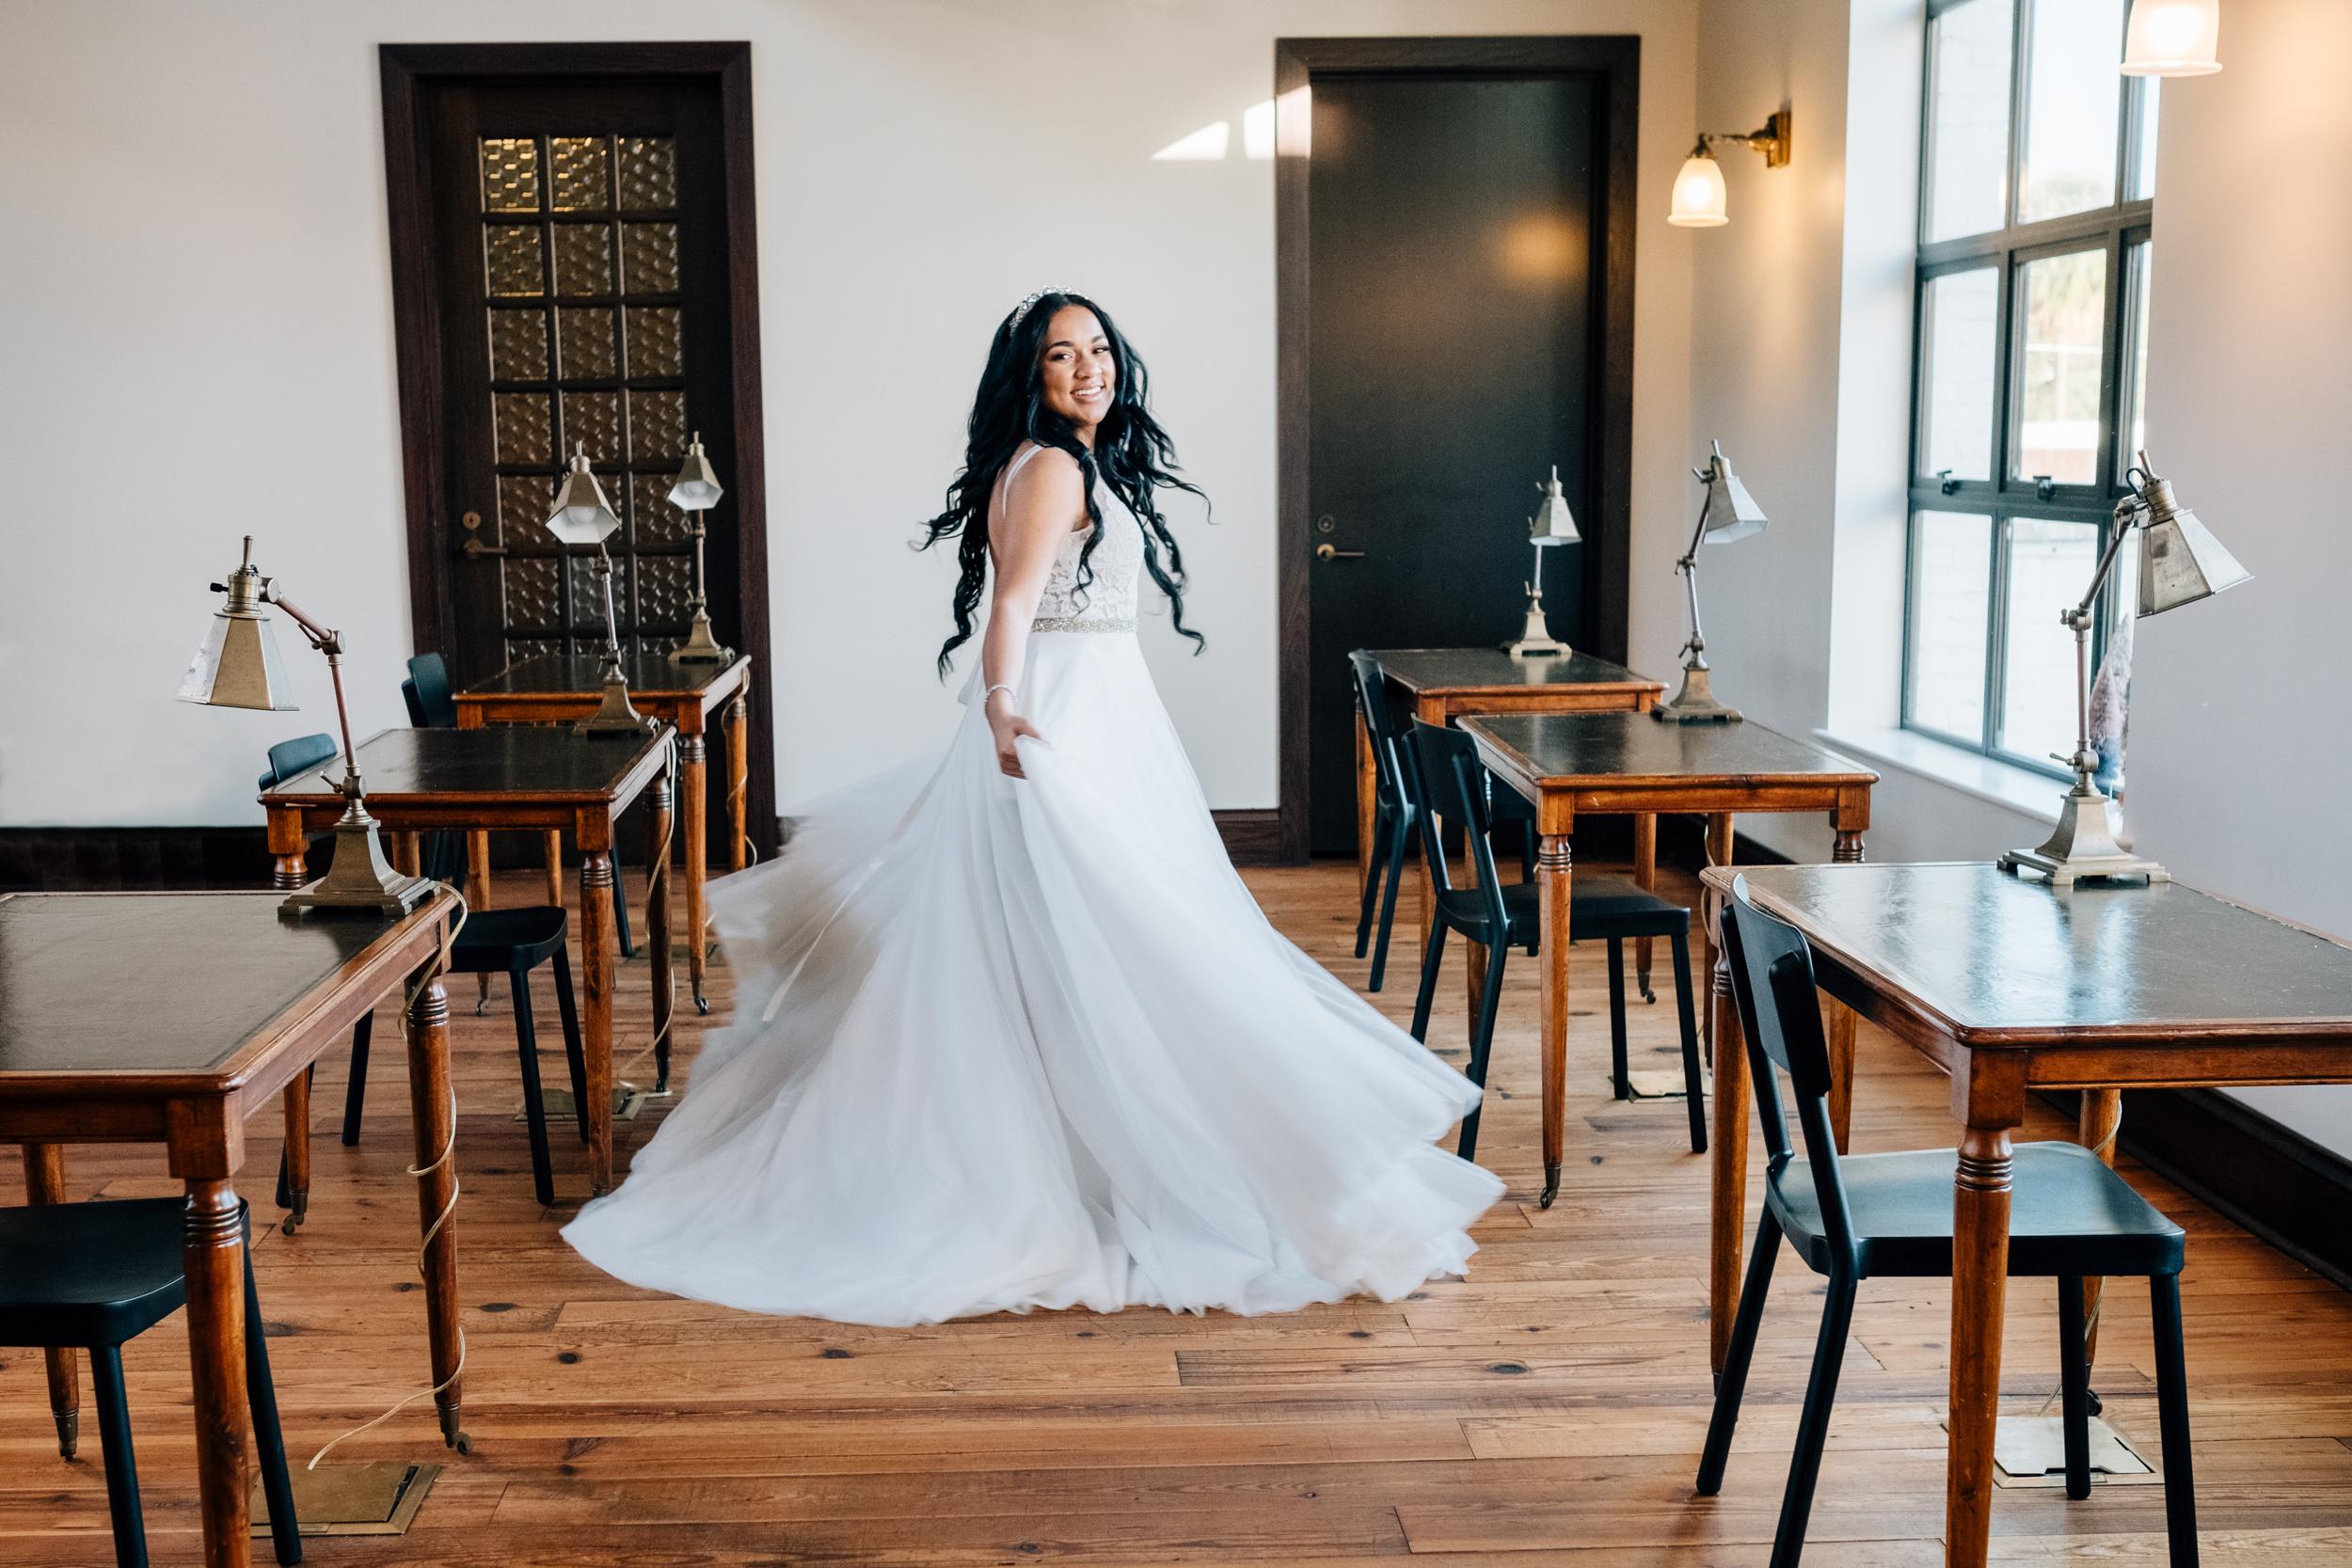 Amethyst Weddings - Erwin & Alondra Preview 005  web.jpg